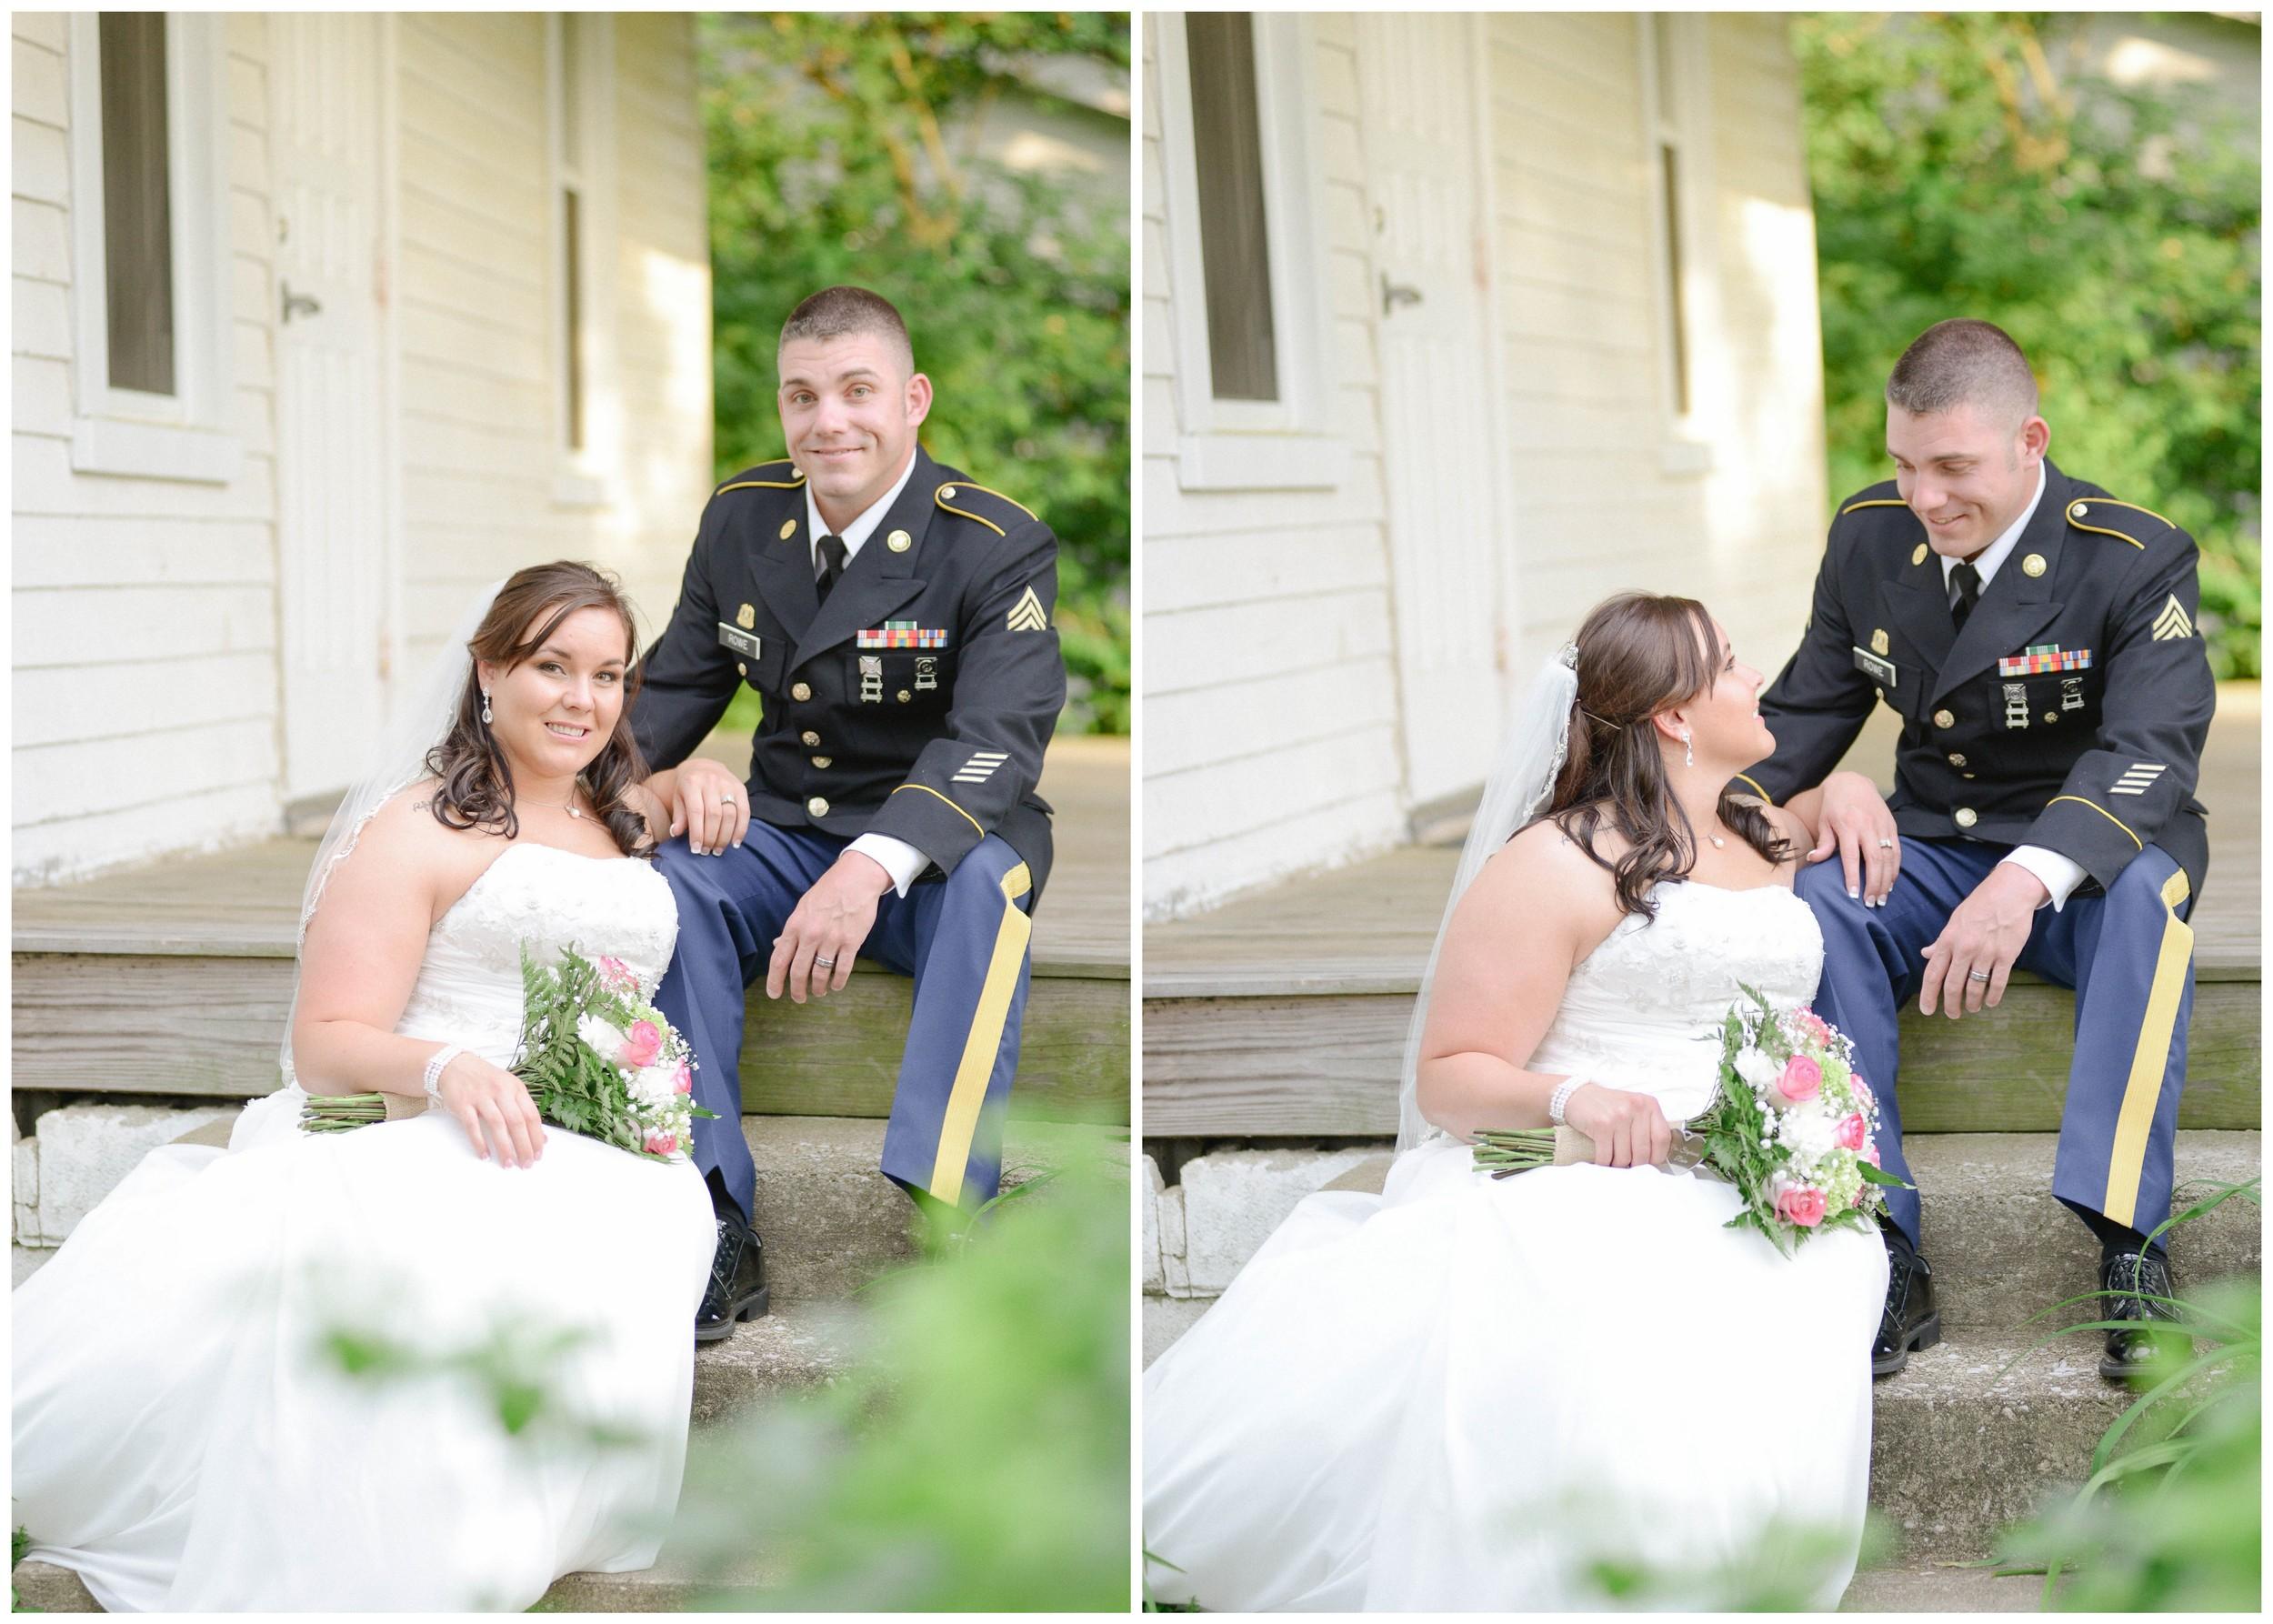 Lexington, KY wedding photography